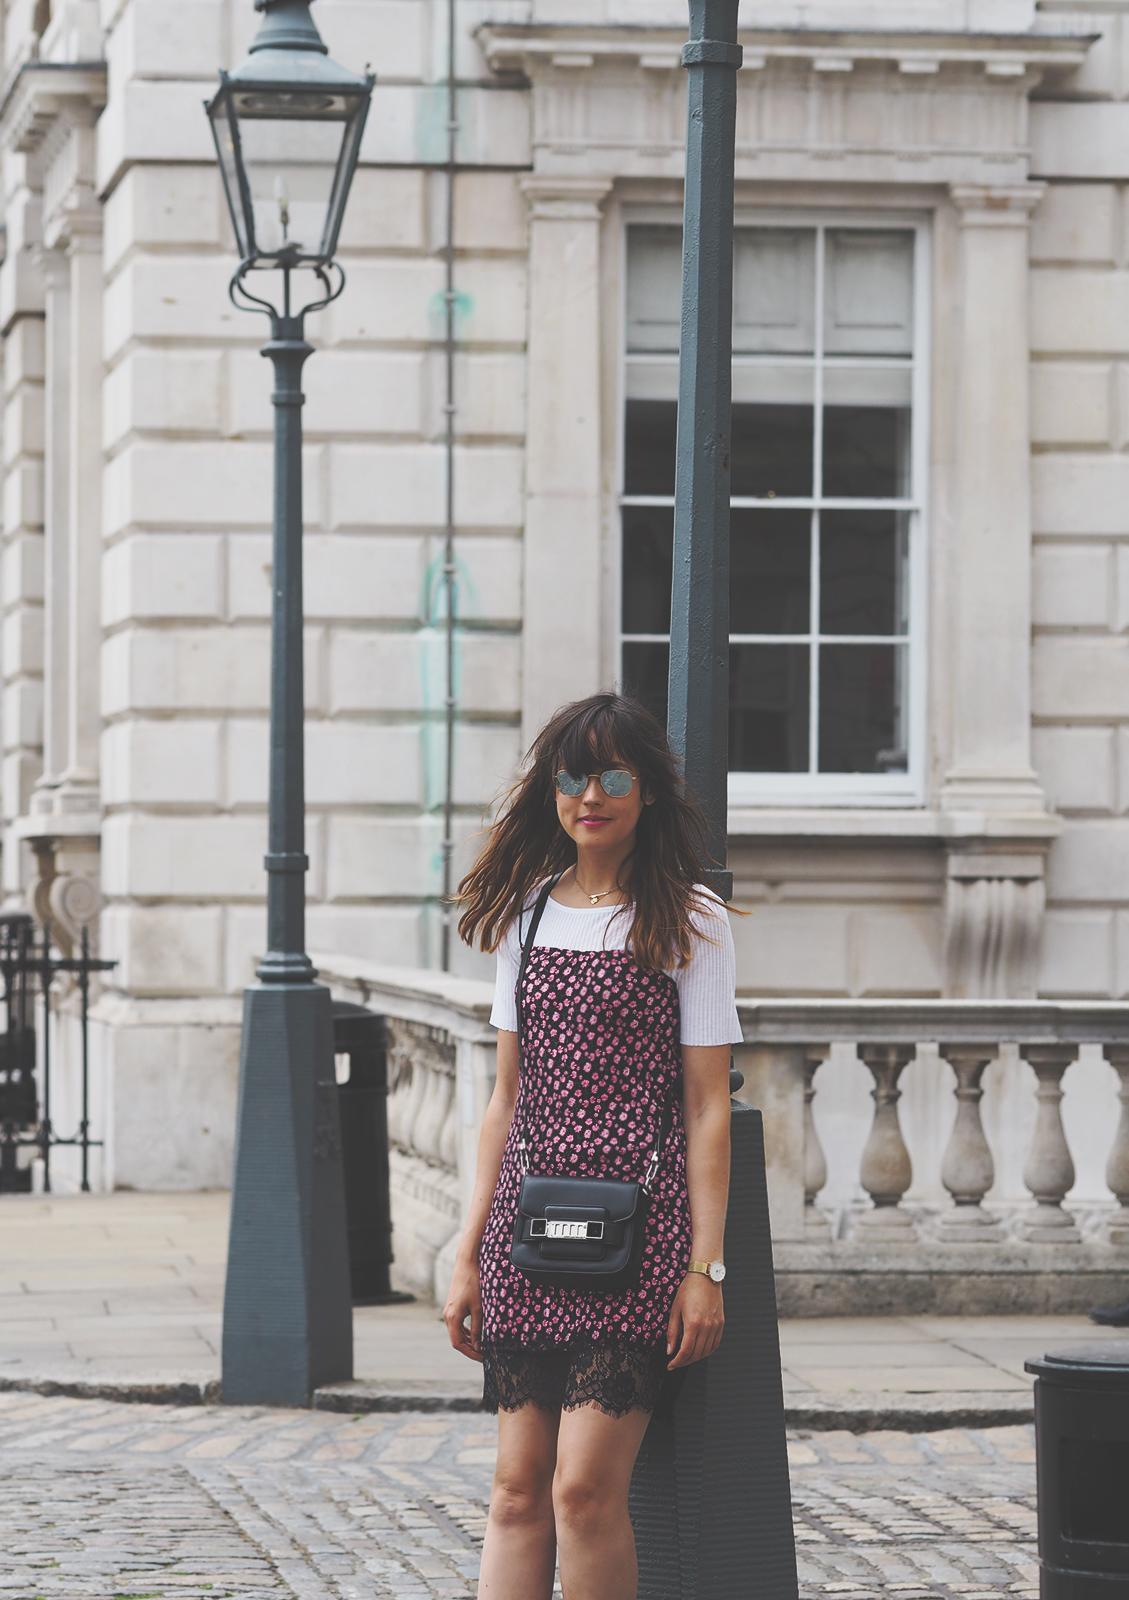 topshop-floral-dress-converse-shoes-proenza-schouler-ps-11-bag-summer-outfit-4